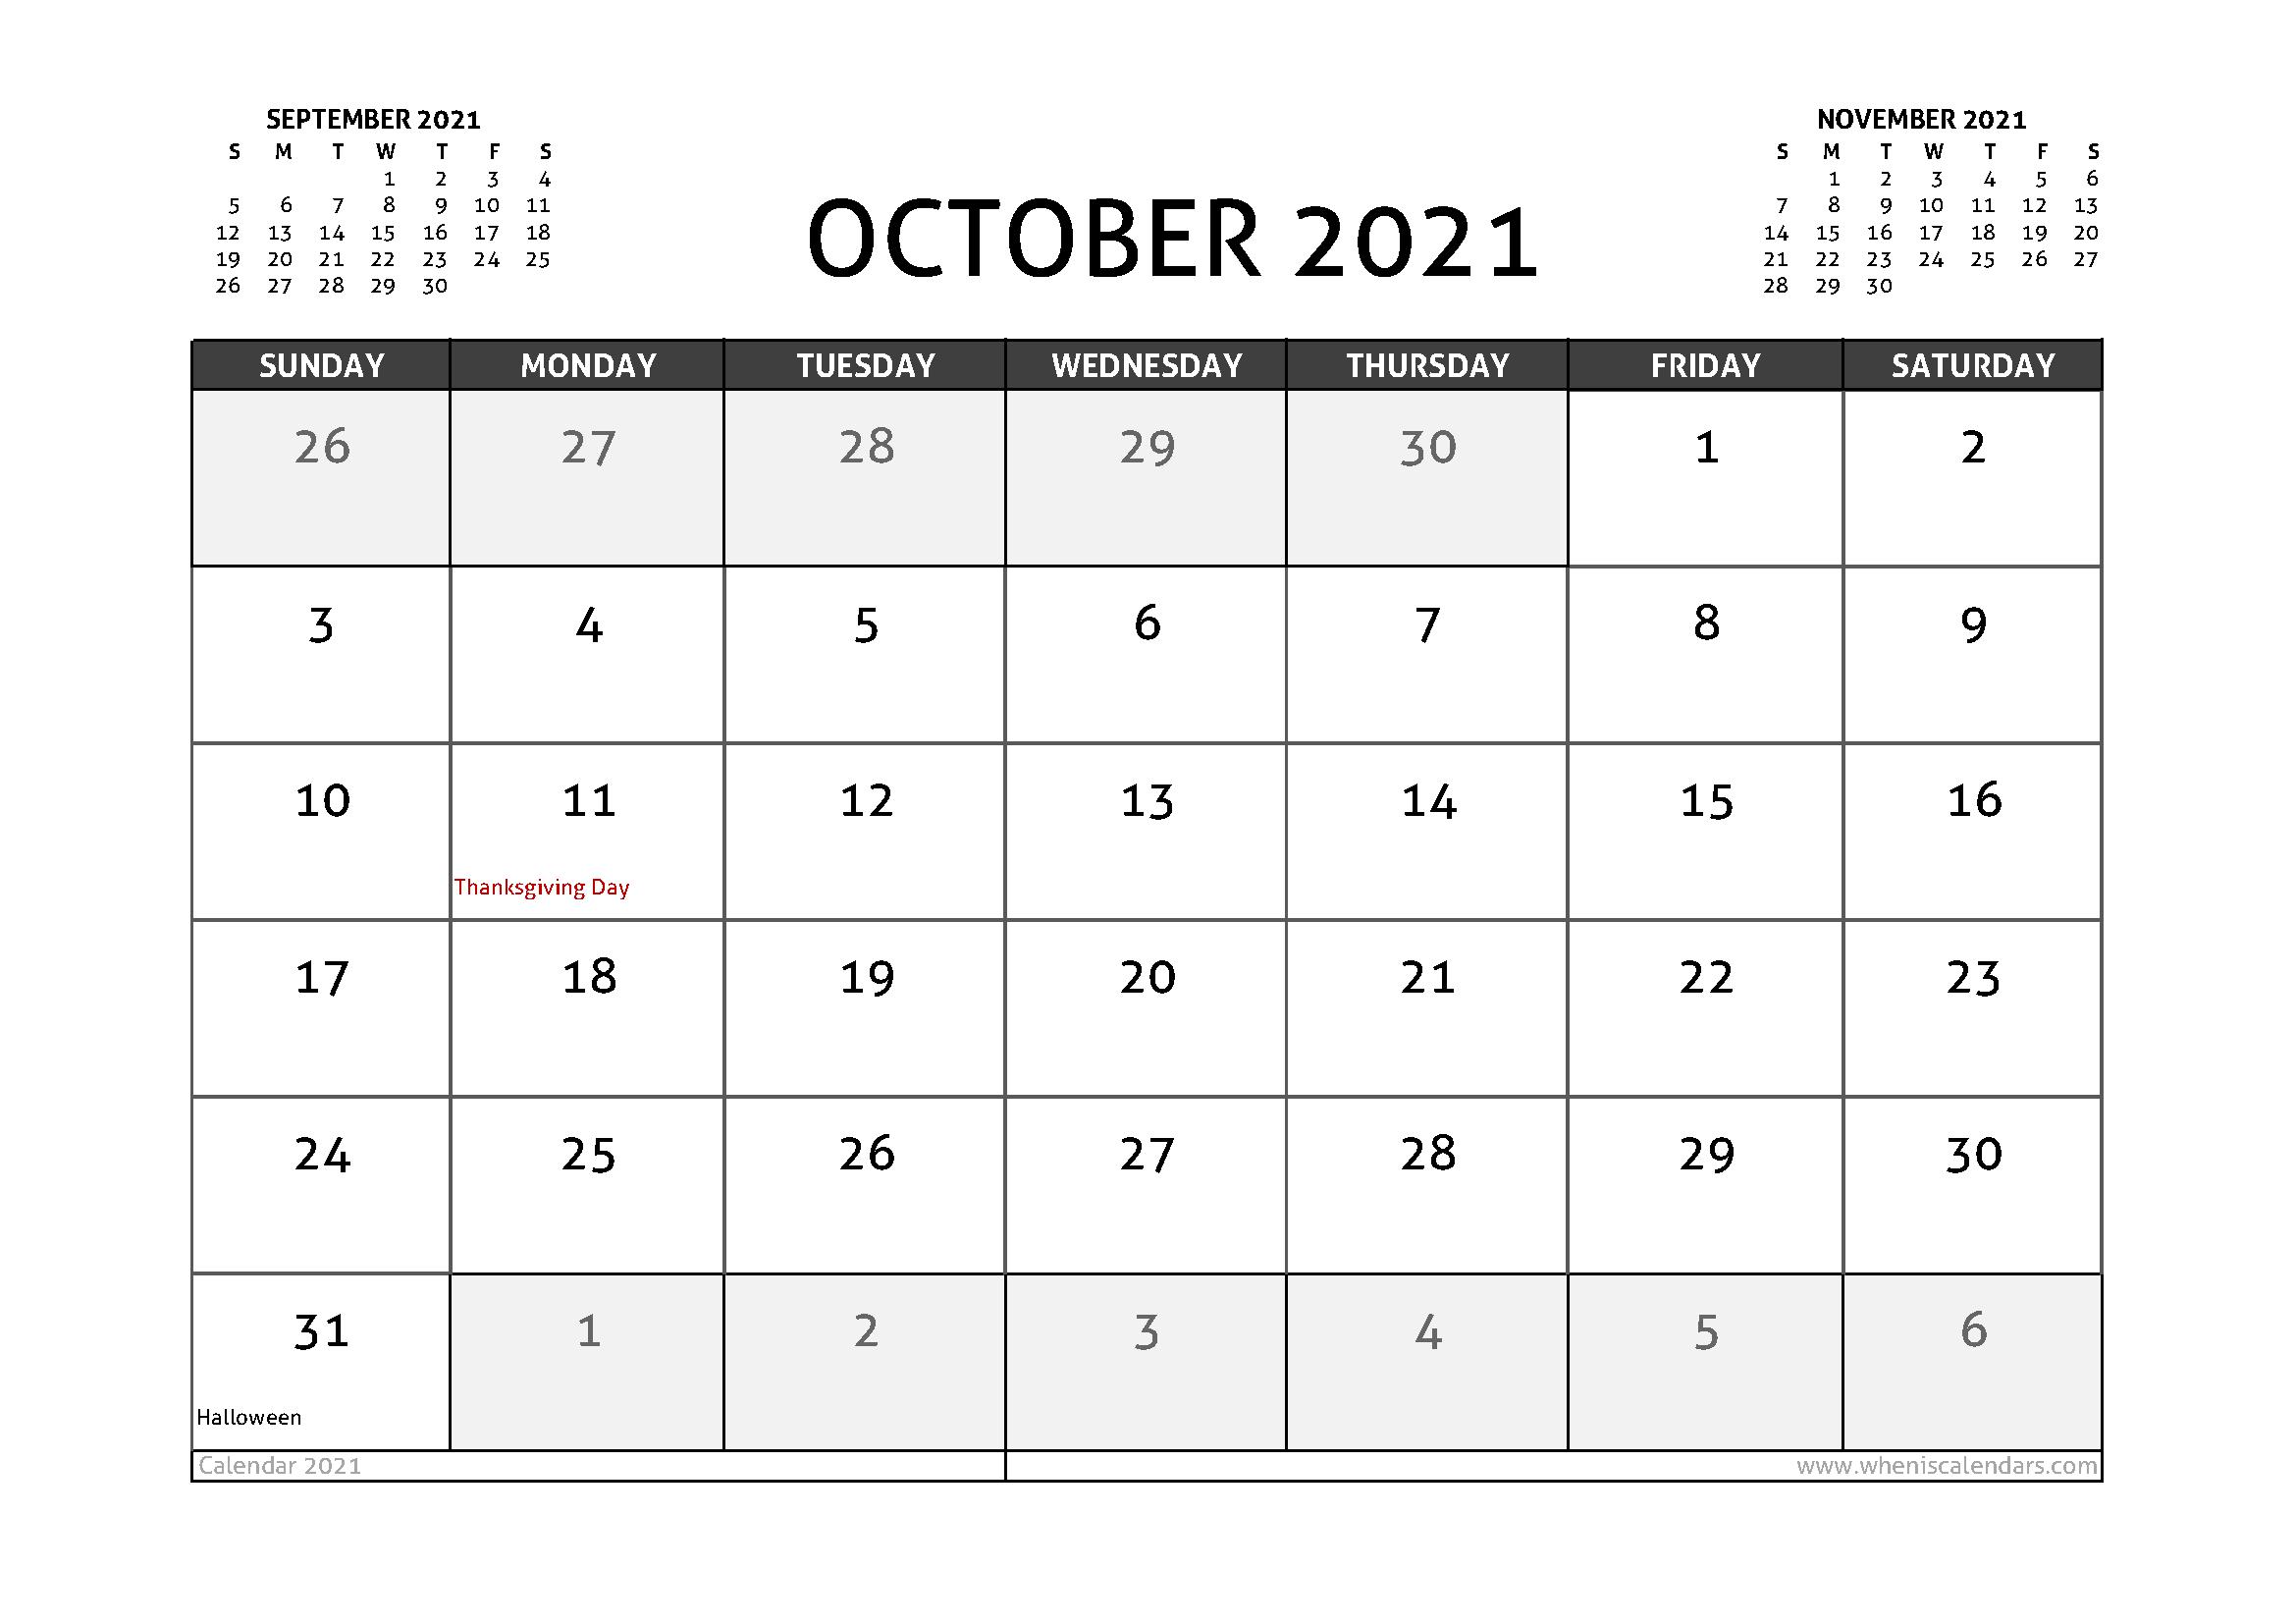 October 2021 Calendar Canada with Holidays